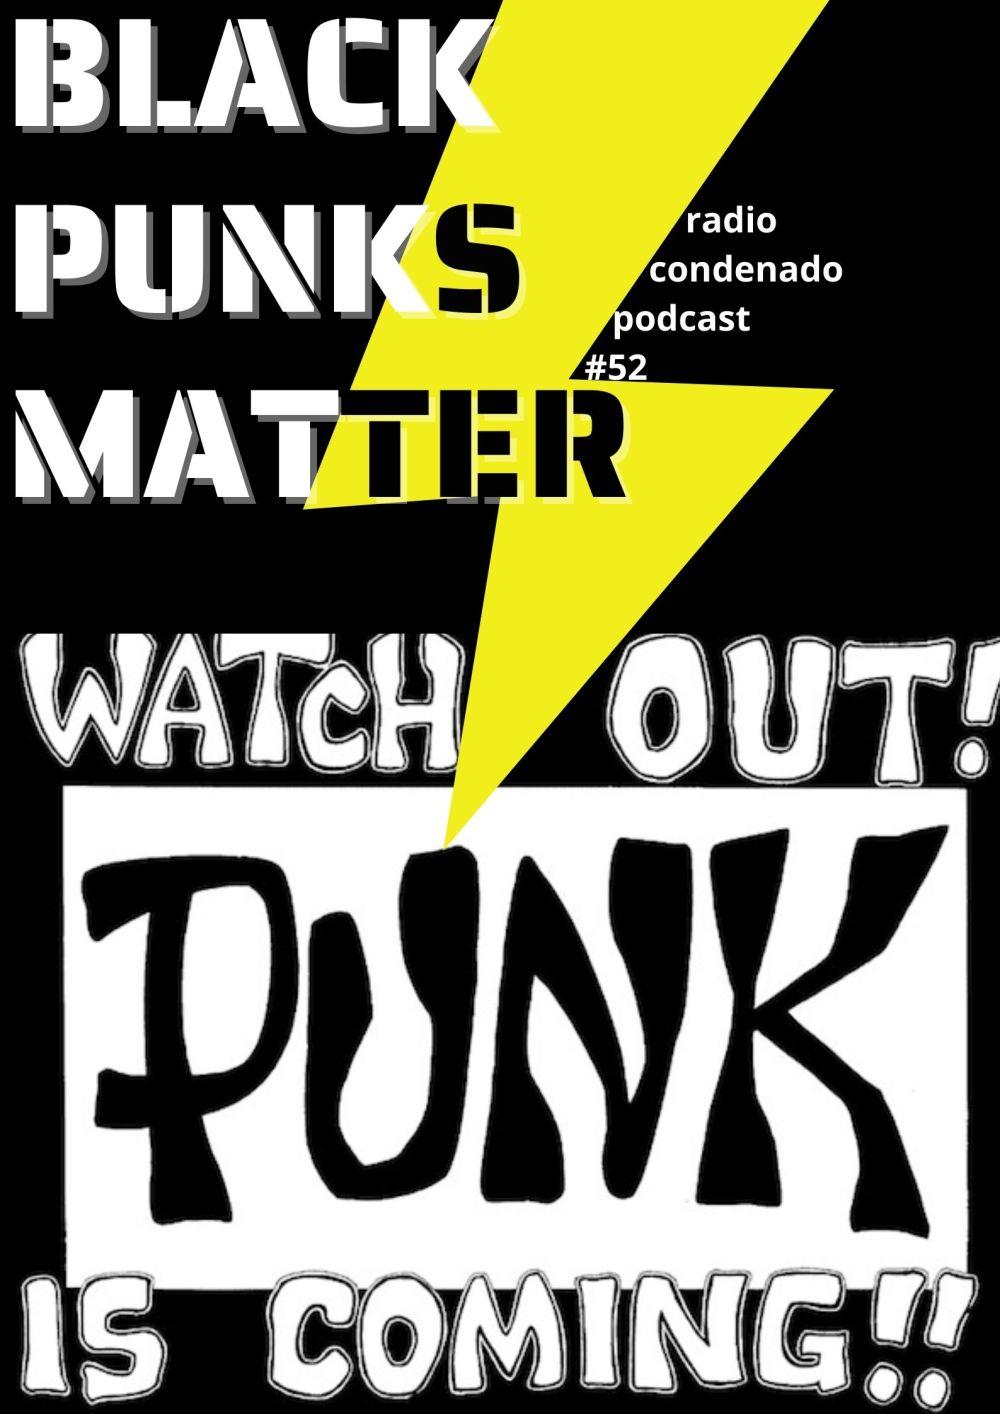 Cartel del podcast de Radio Condenado #52 | Black Punks Matter